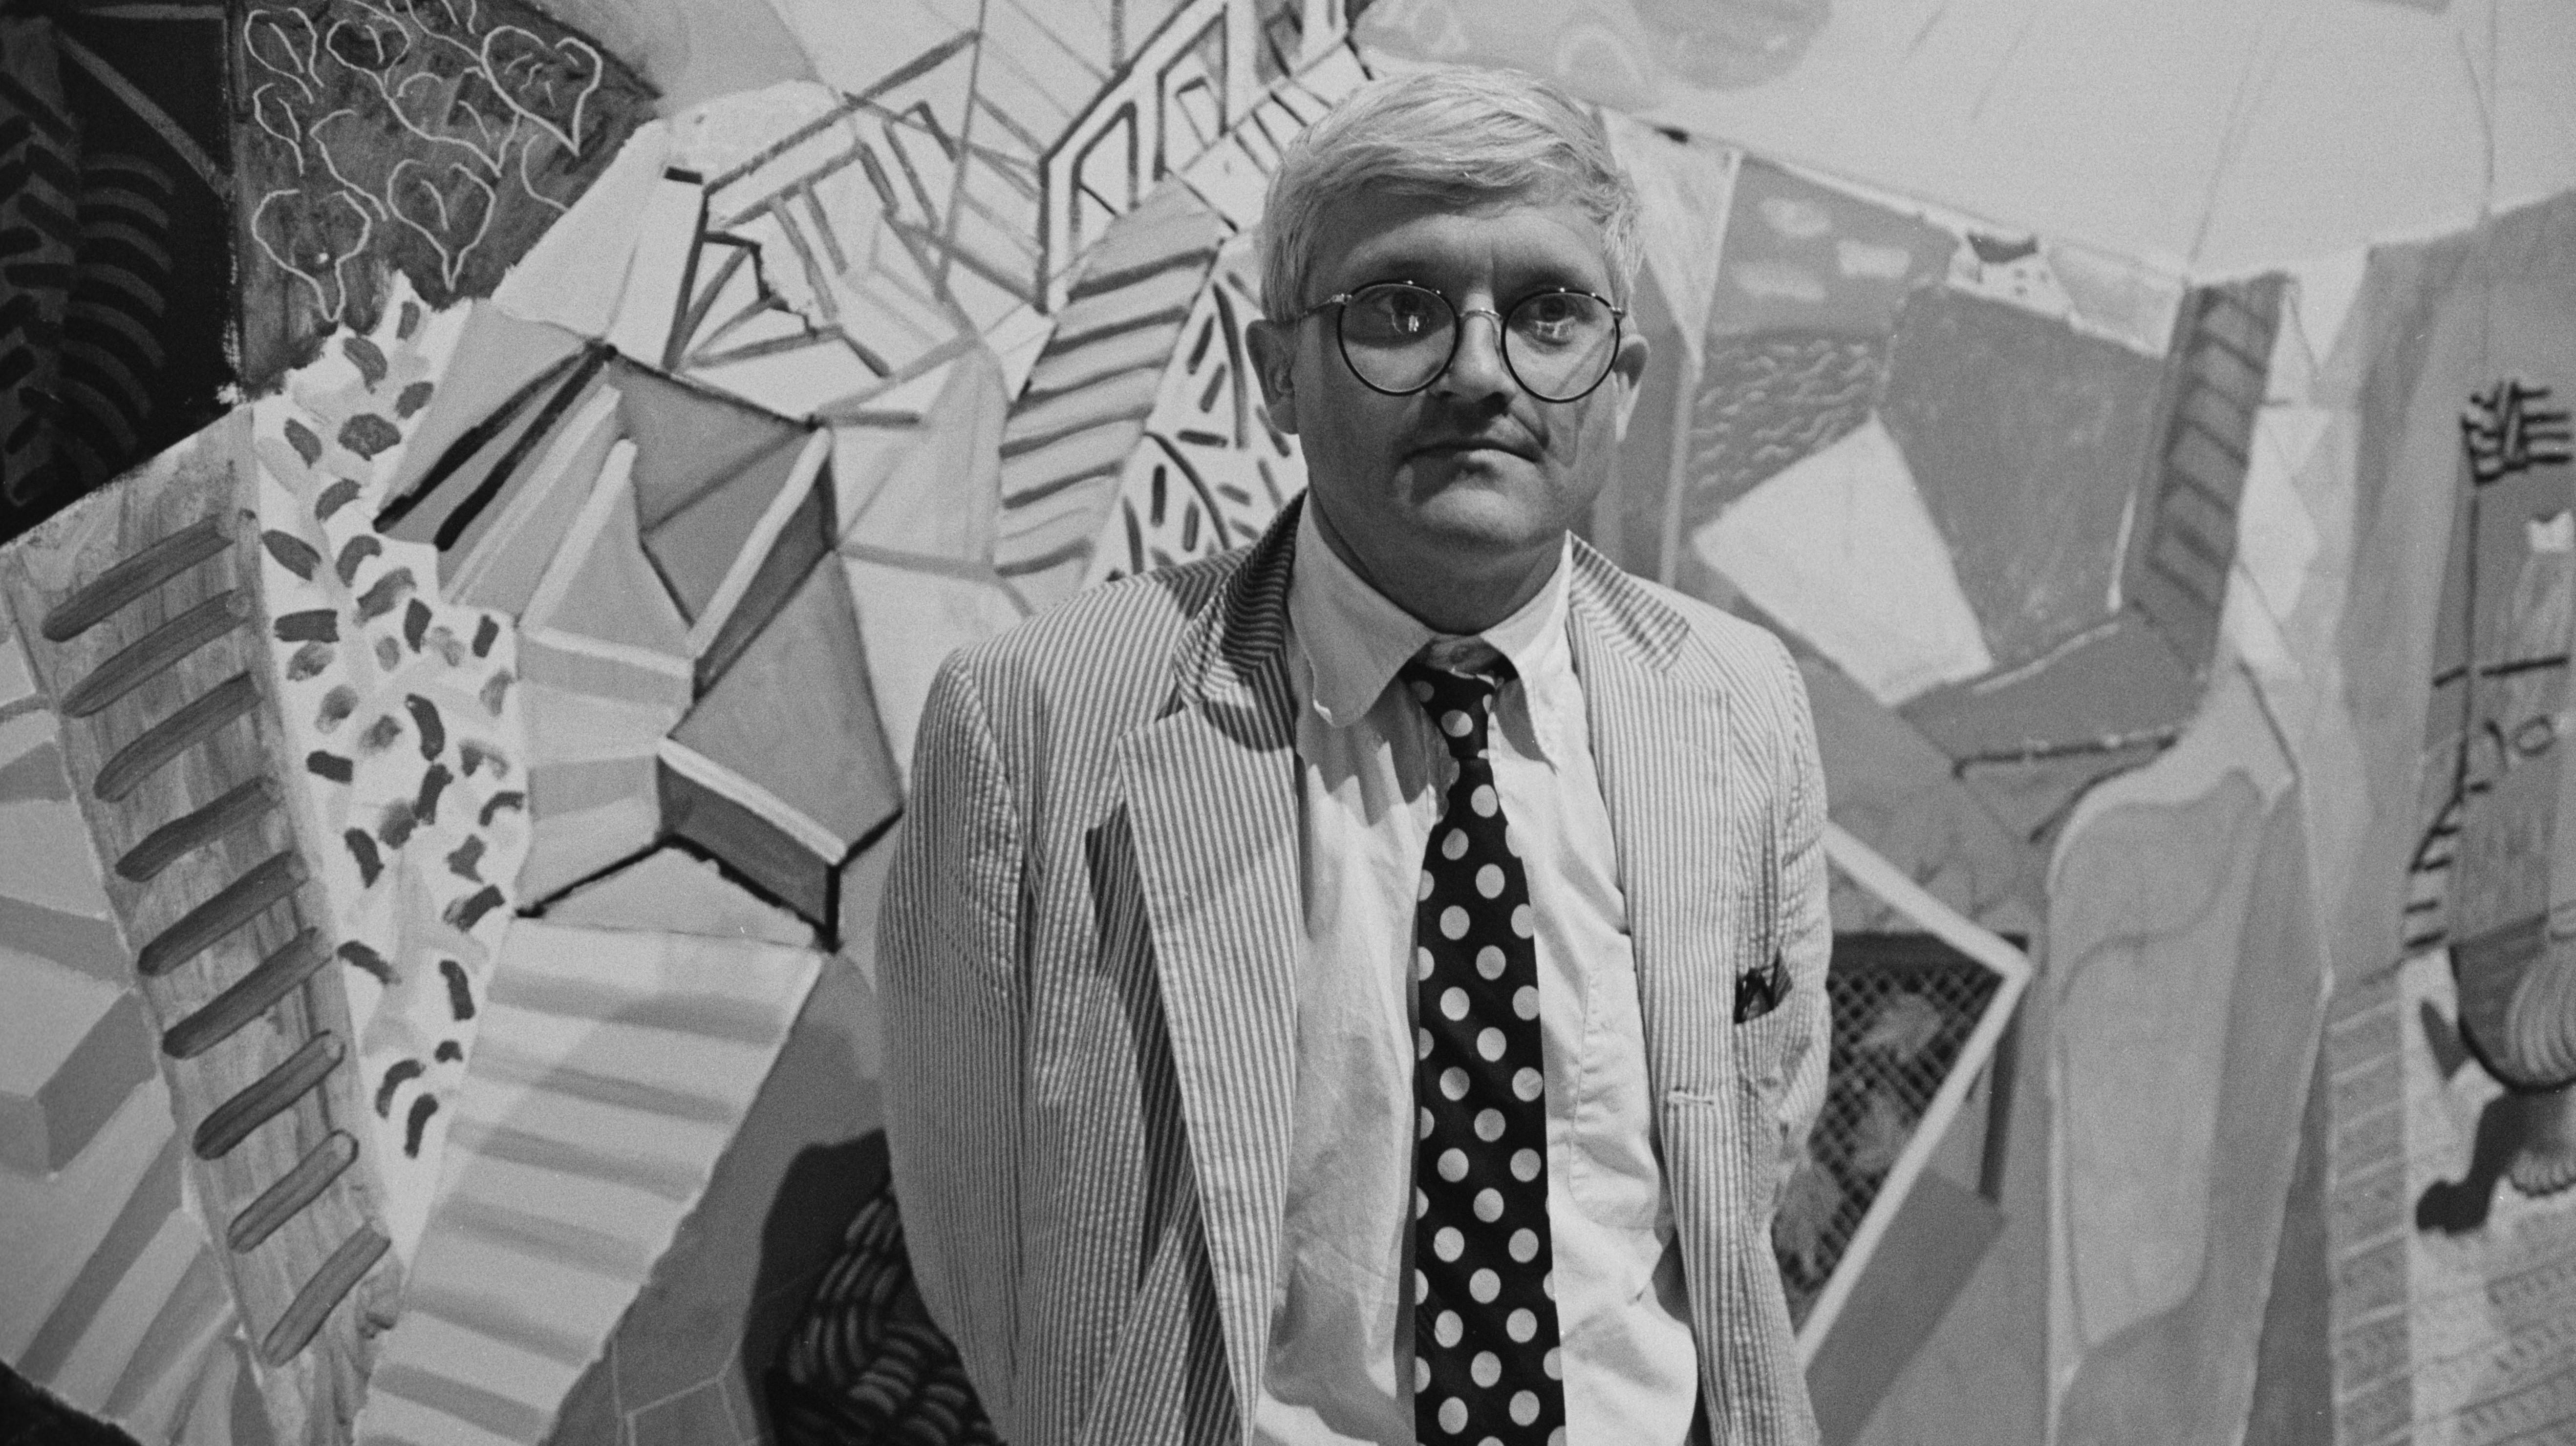 David Hockney Painting of Former Lover Fetches $93 Million, Breaks Record for Living Artist